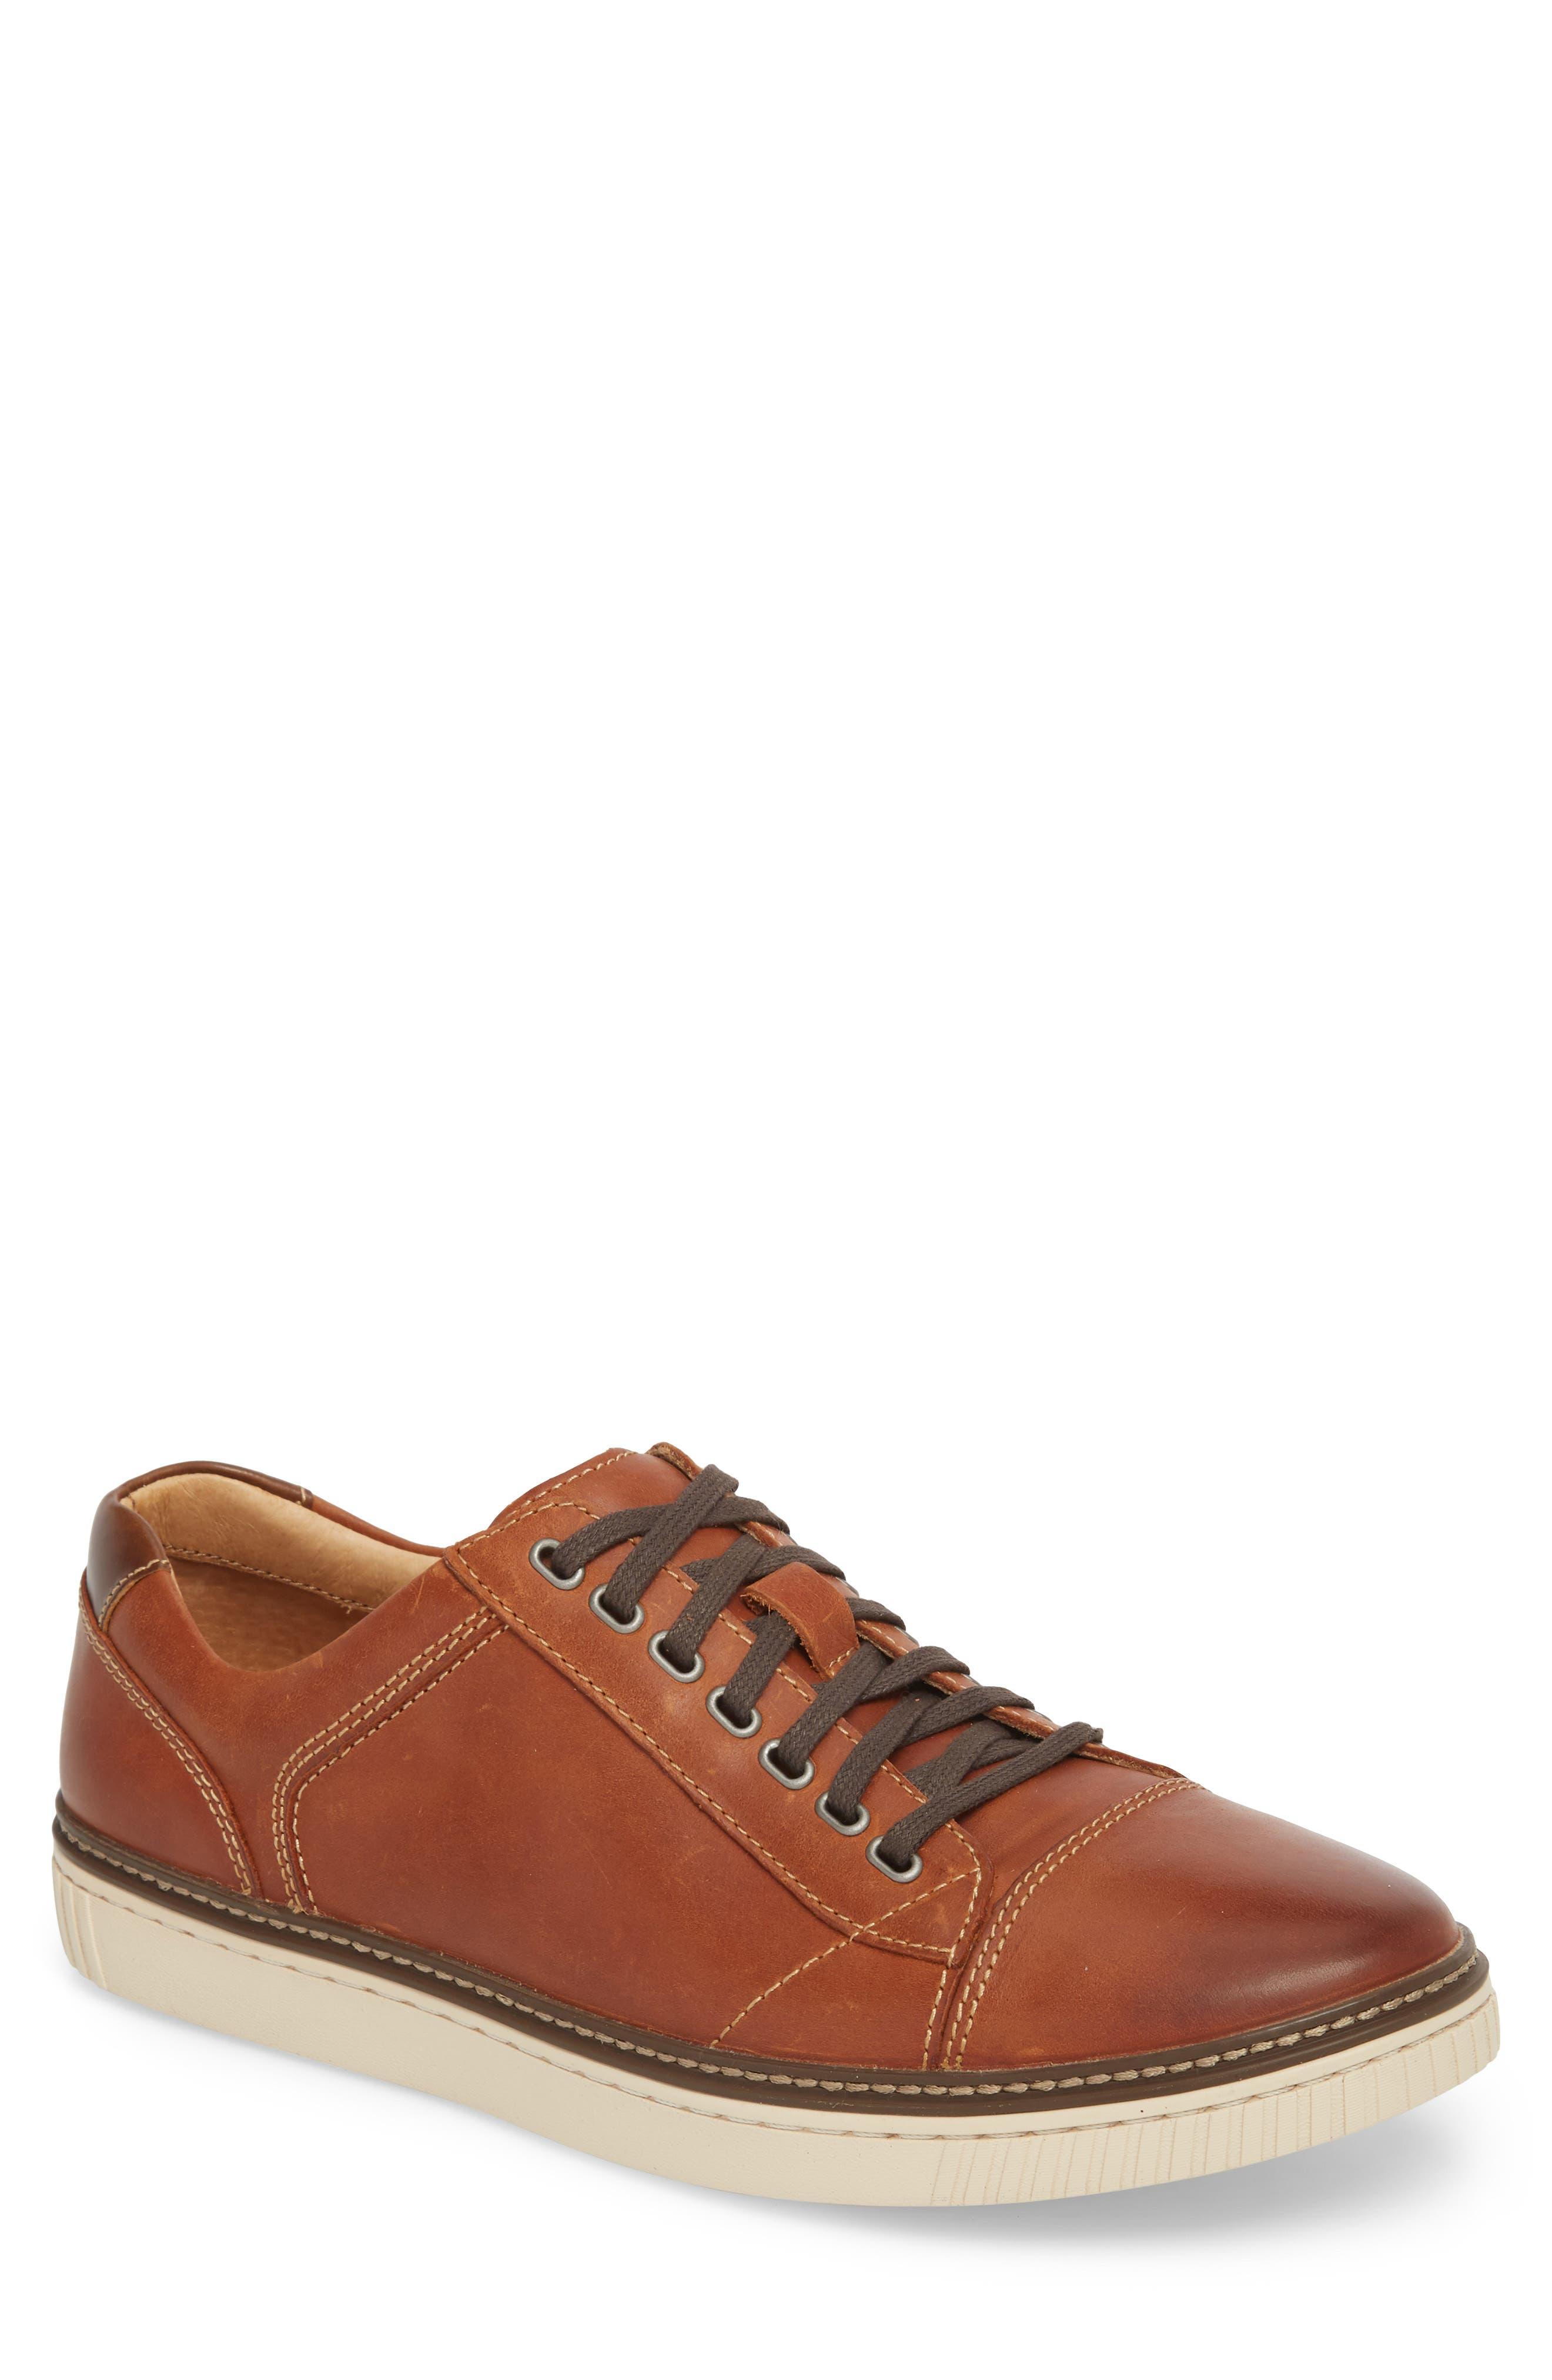 Wallace Low Top Sneaker,                         Main,                         color, Tan Nubuck